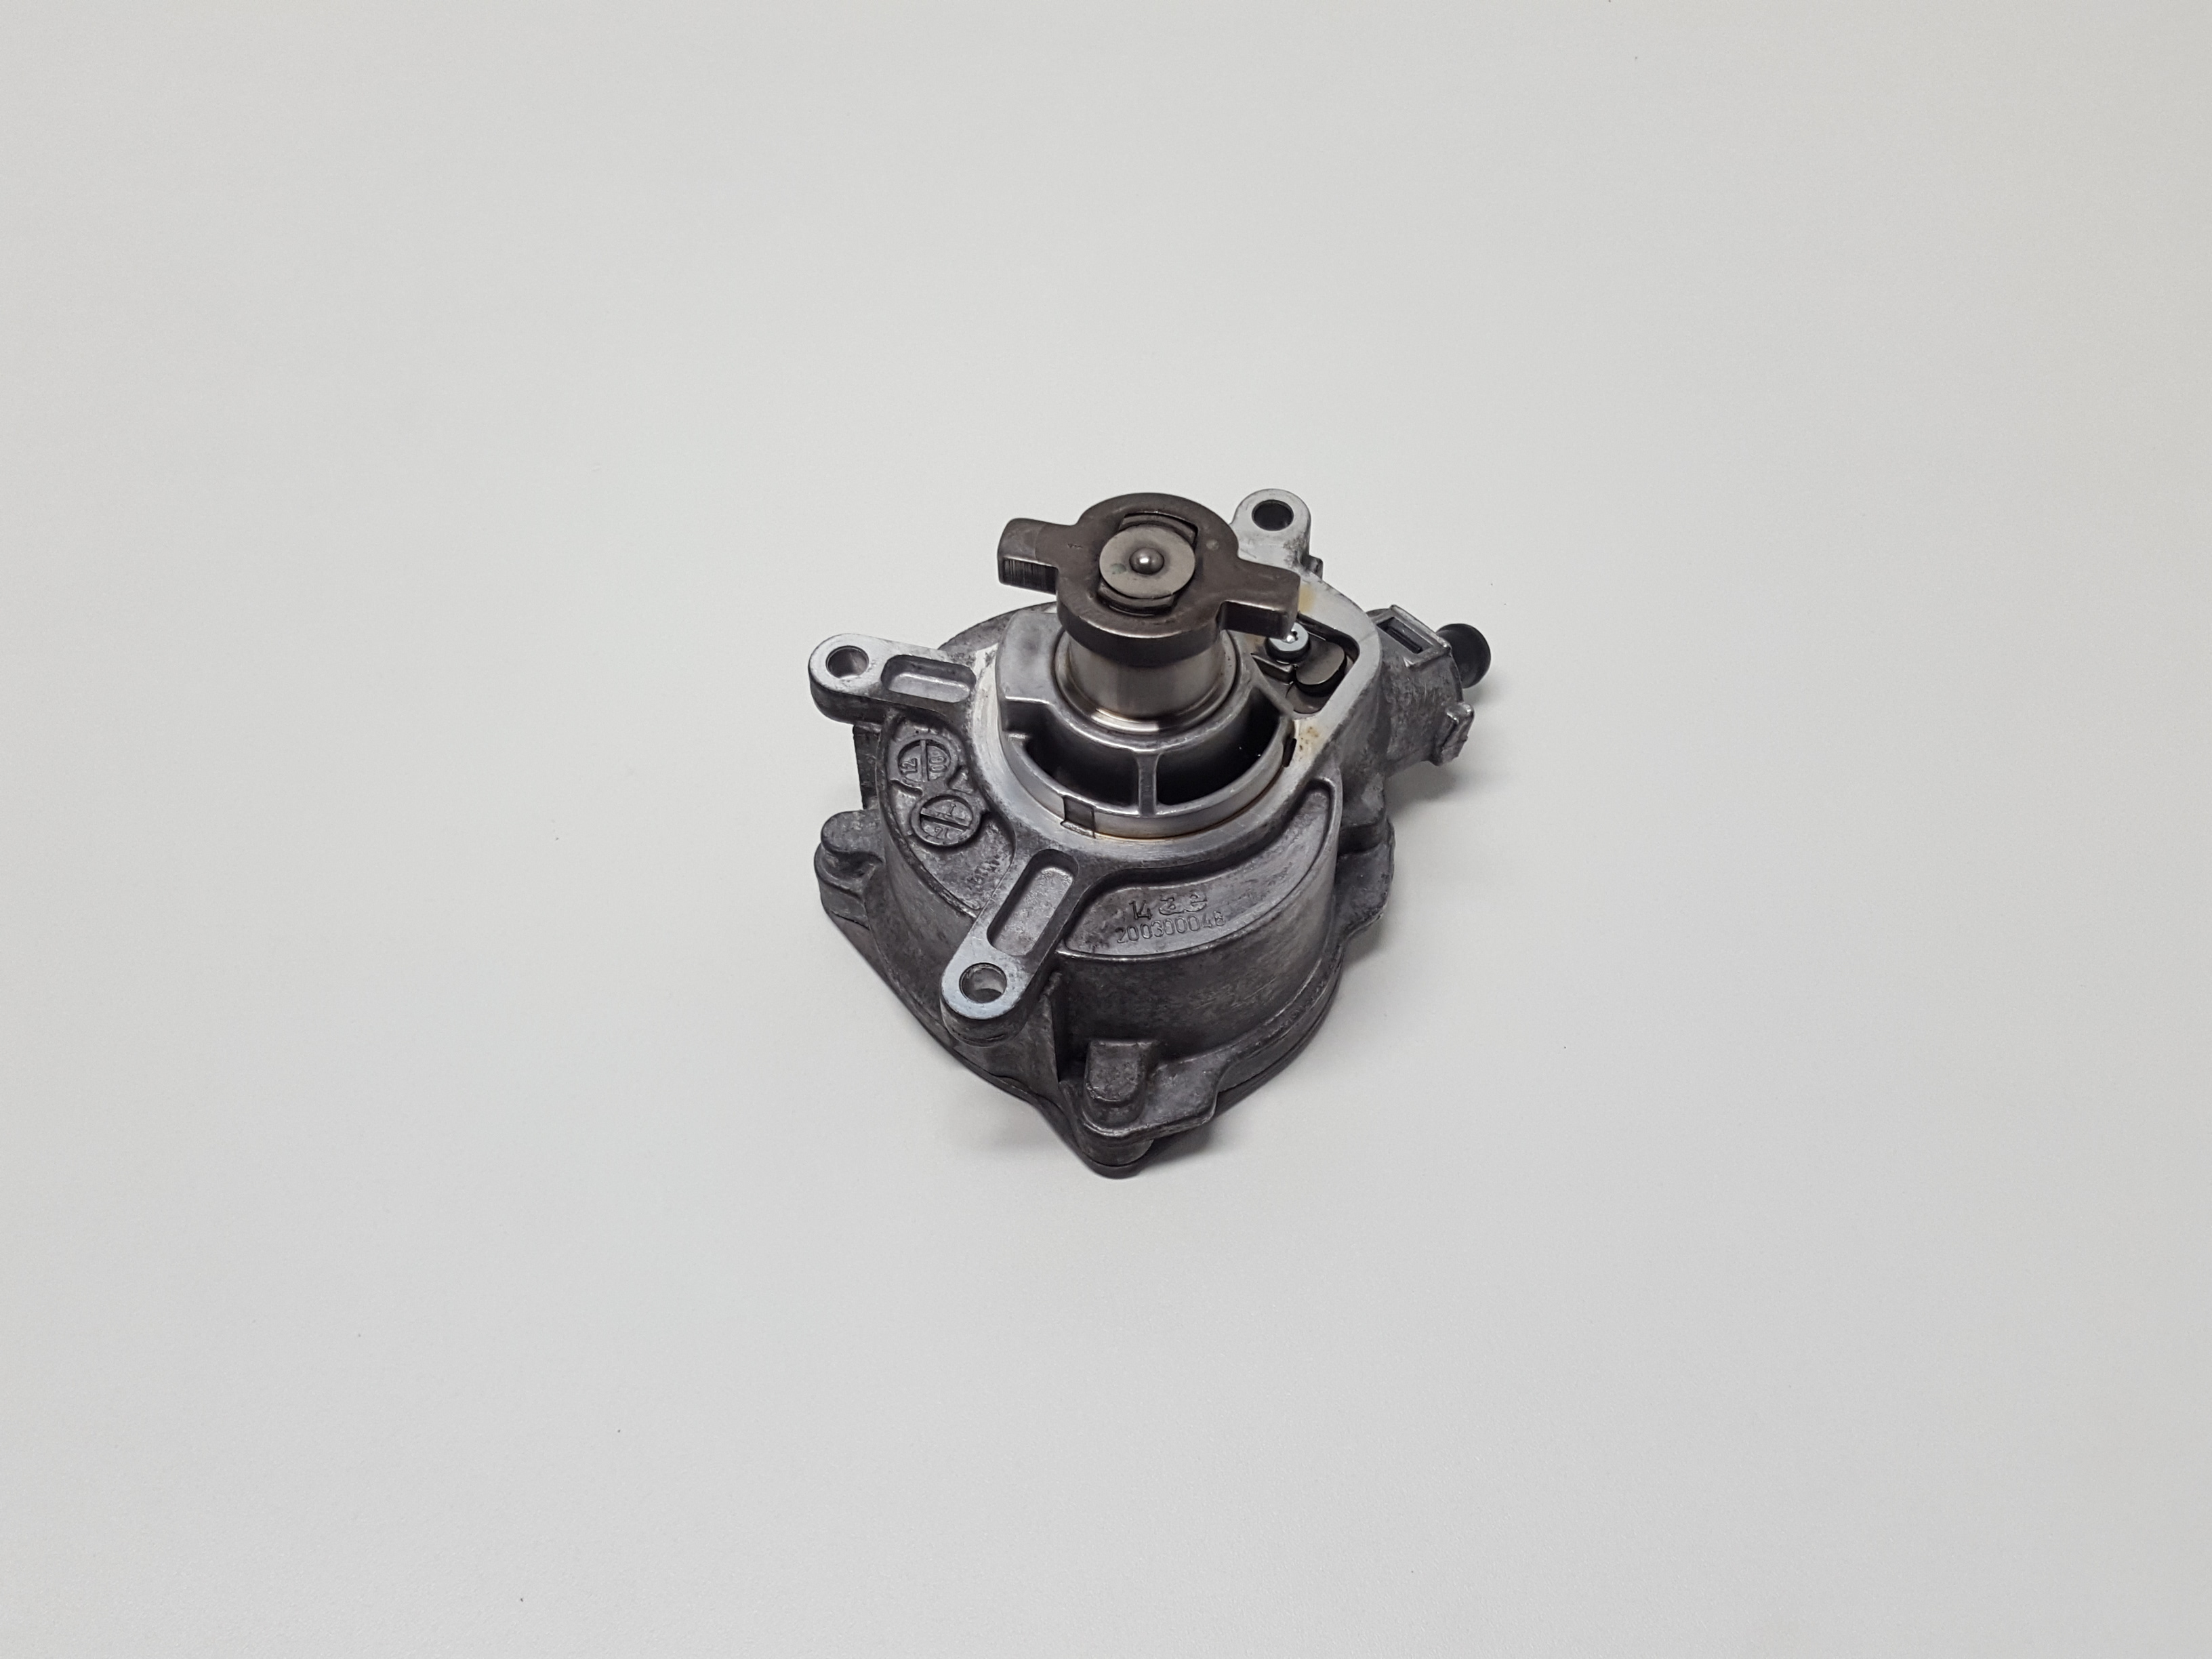 FÜR AUDI TT RS Q3 8U A3 S3 RS3 2.5 FSI TFSI UNTERDRUCKPUMPE VAKUUMPUMPE DICHTUNG